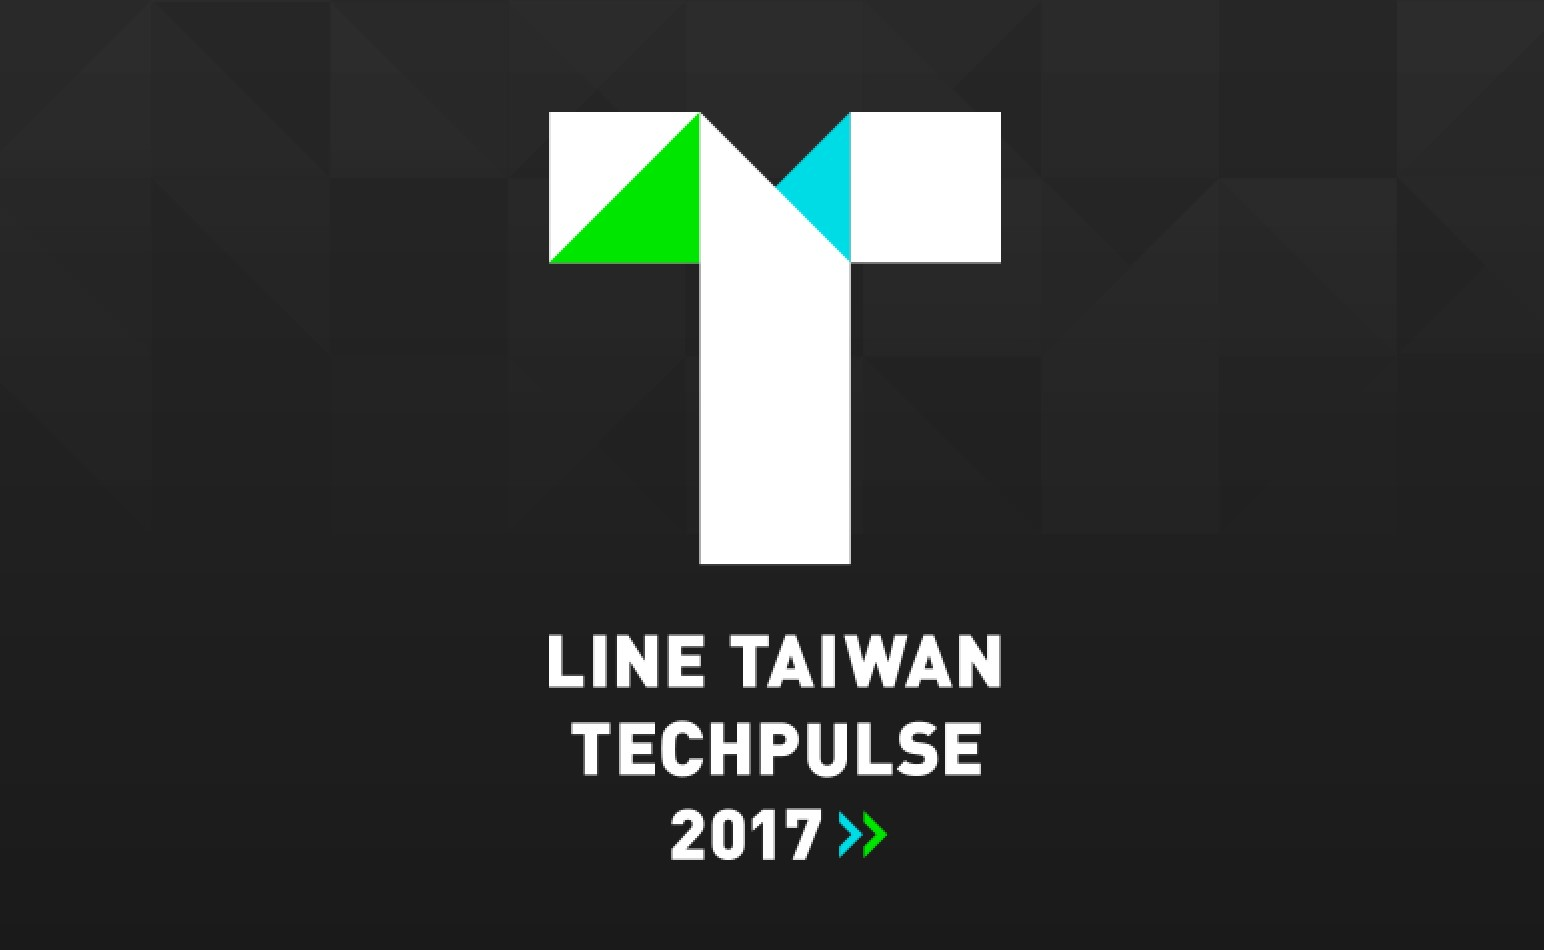 LINE Taiwan TechPulse大會11月3日登場 即日起開放報名